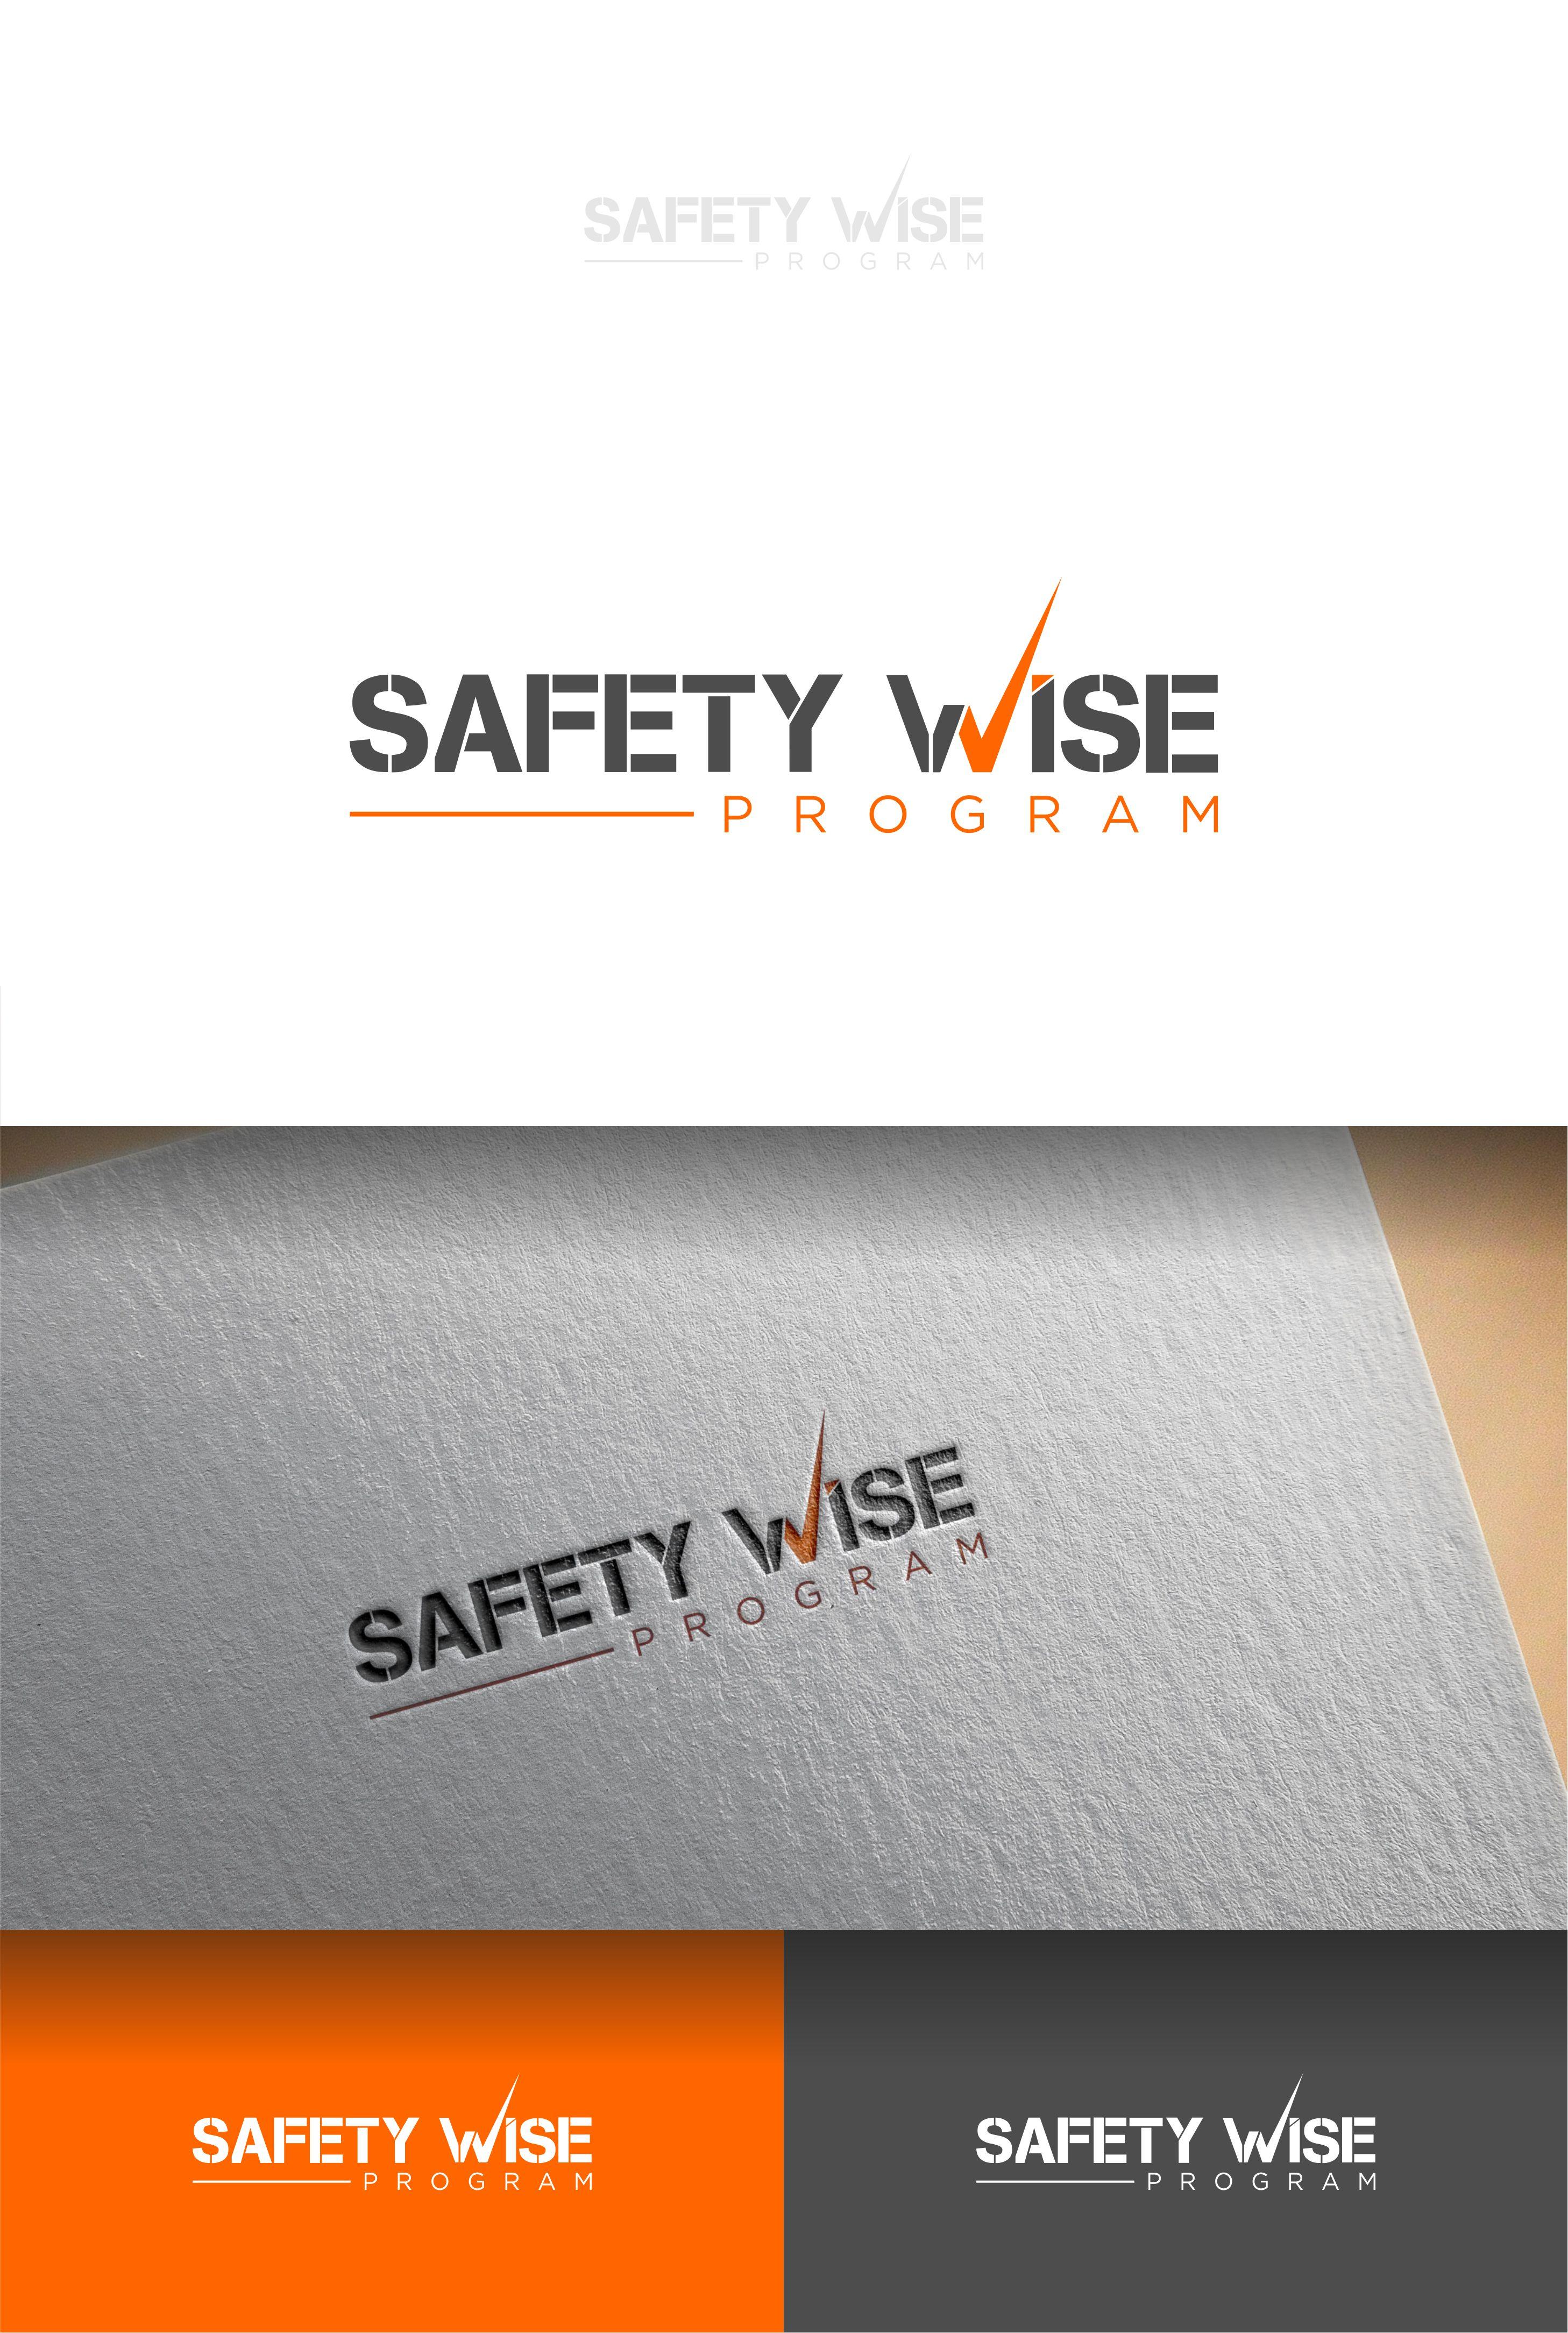 Logo Design by Raymond Garcia - Entry No. 115 in the Logo Design Contest New Logo Design for Safety Wise Program.